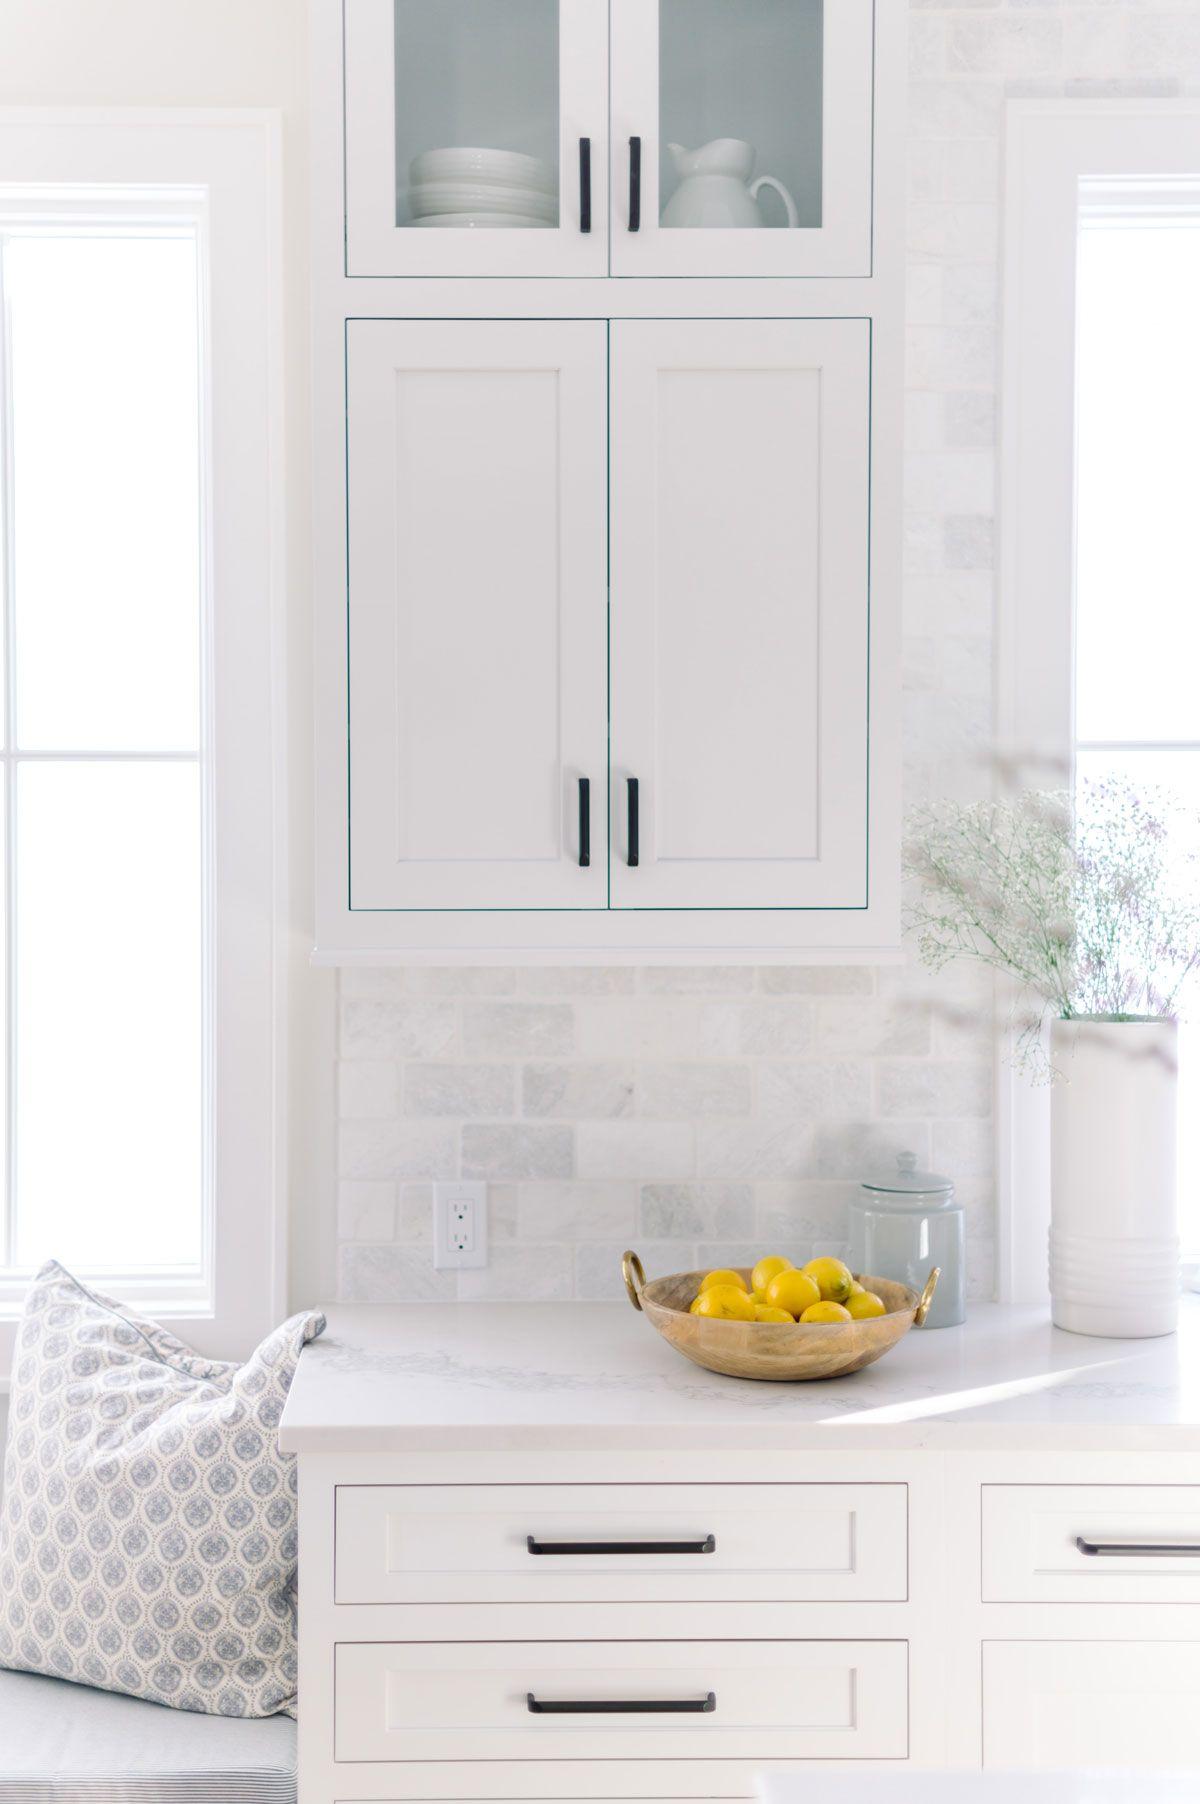 Before And After Timberline Project Reveal Interior Designer Des Moines Jillian Lare In 2020 Kitchen Backsplash Designs Kitchen Marble Backsplash For White Cabinets